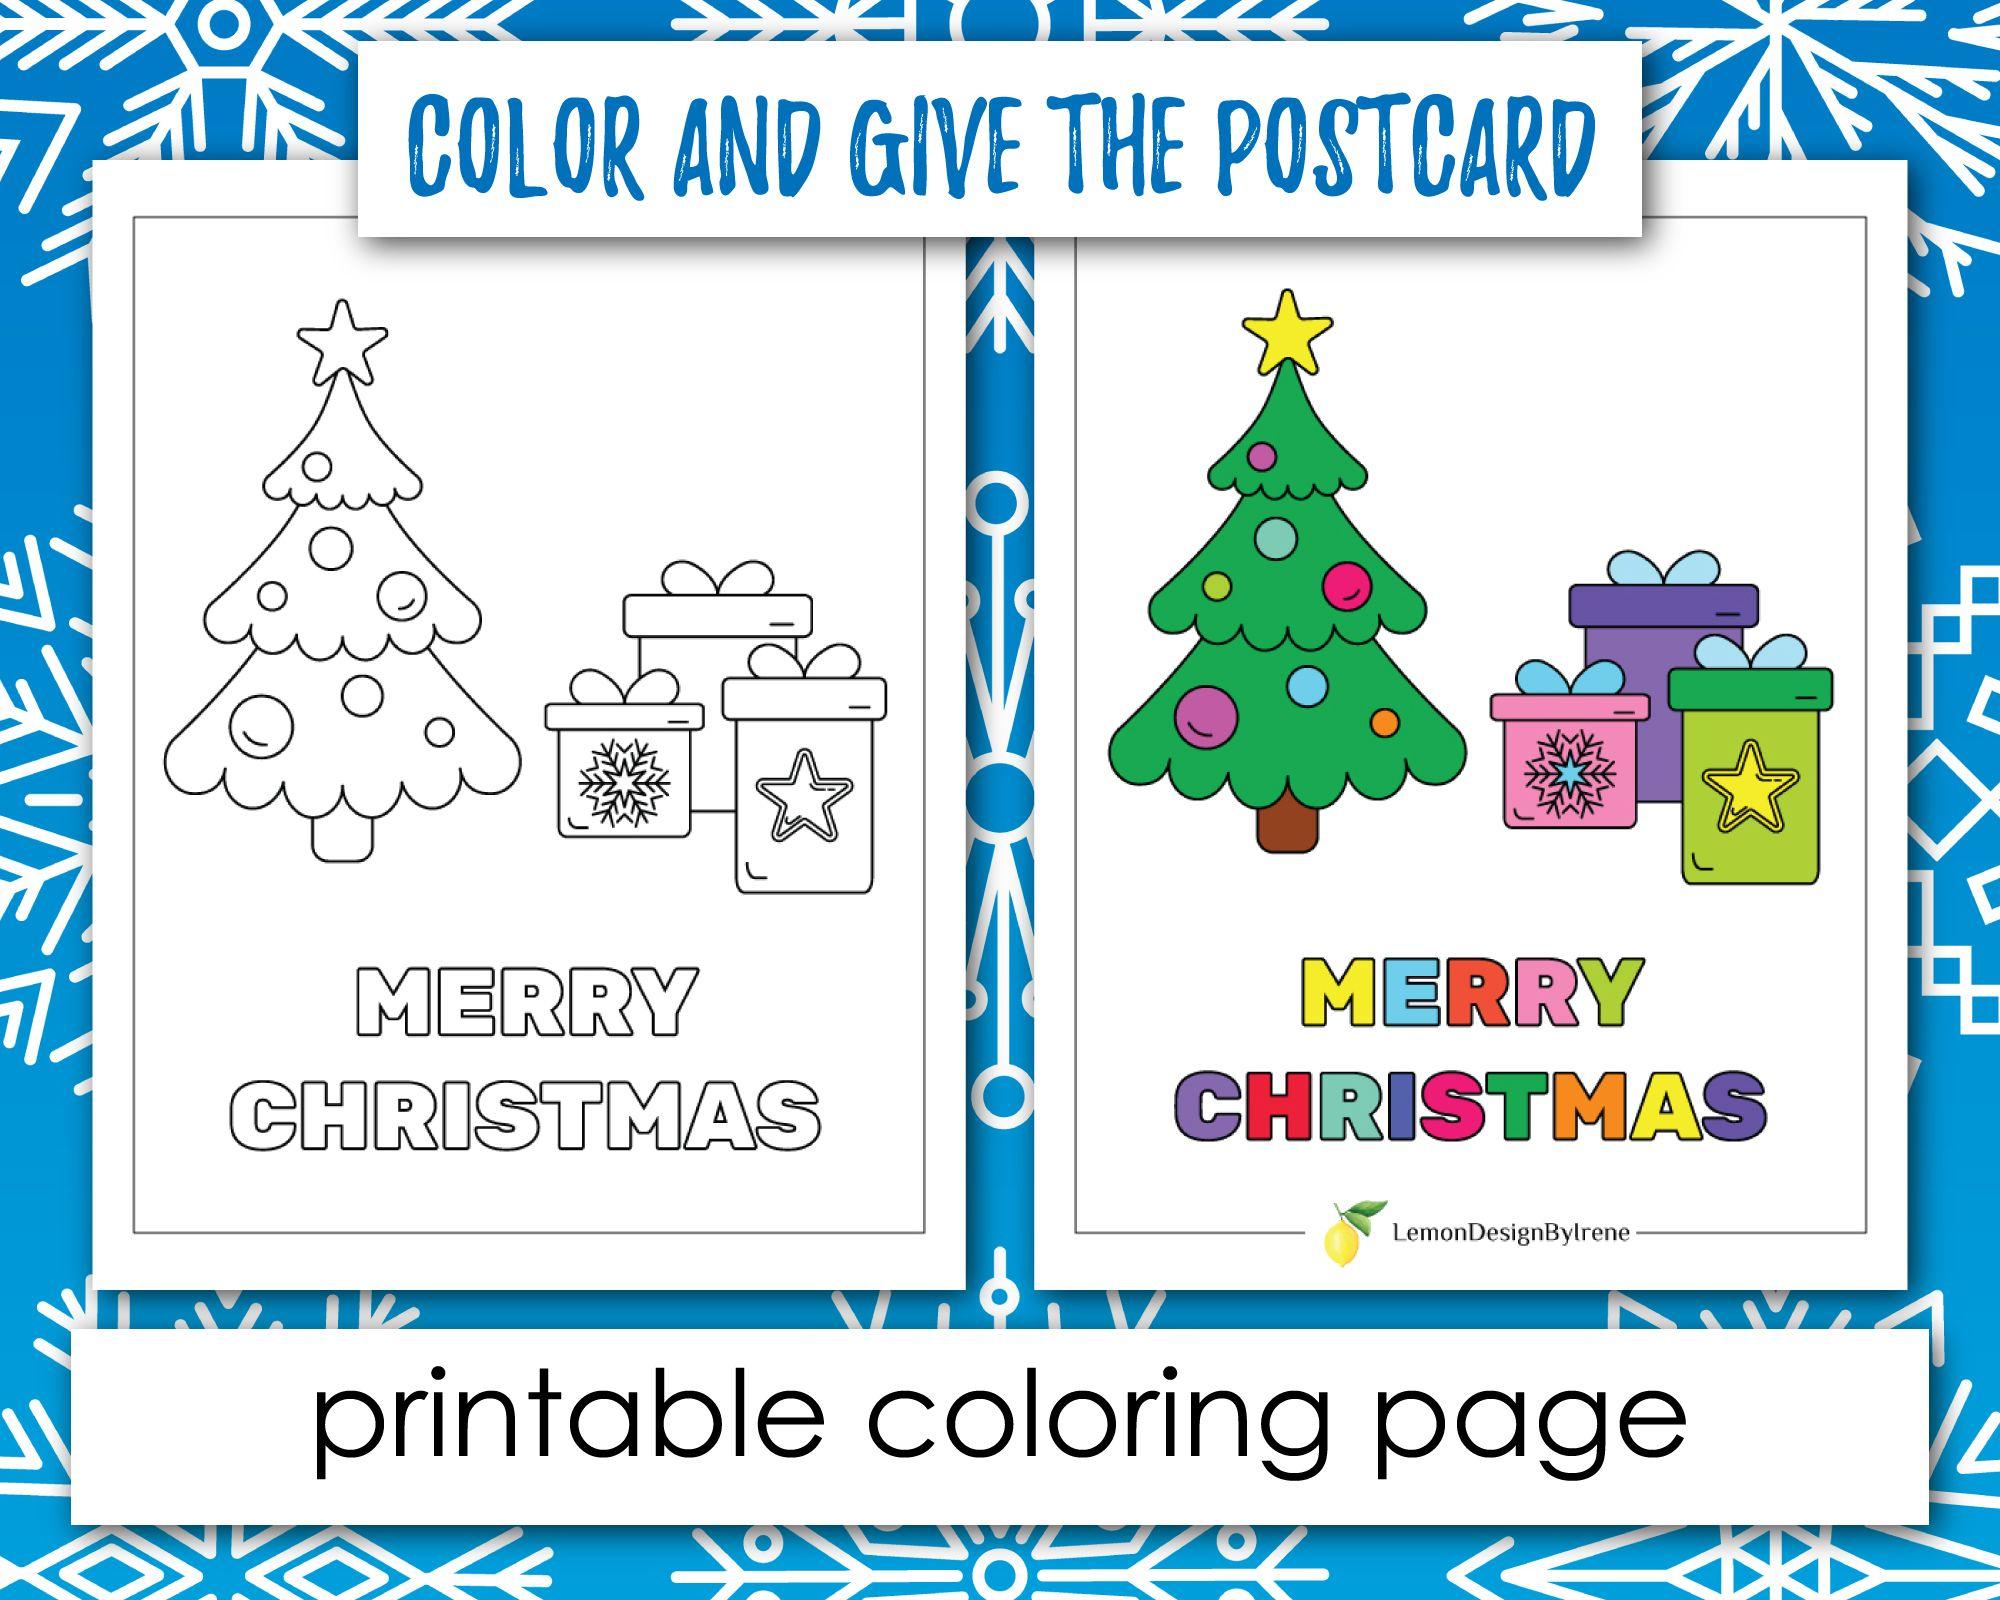 10 Free Printable Colouring Xmas Cards Christmas Coloring Cards Free Christmas Coloring Pages Christmas Coloring Sheets